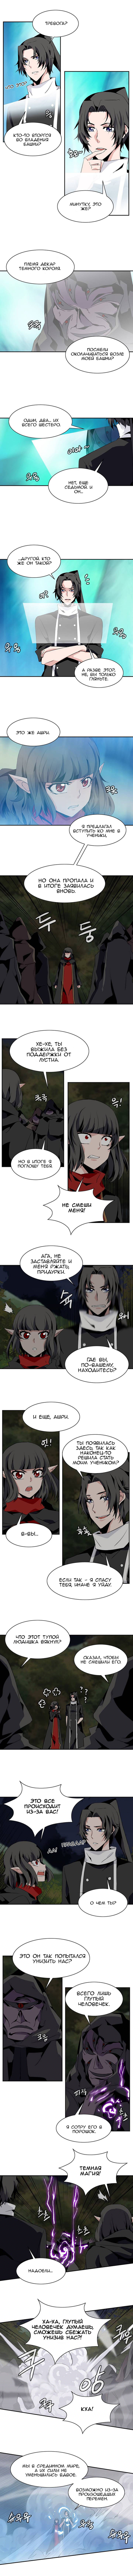 https://r1.ninemanga.com/comics/pic2/48/28784/440786/153777794829.jpg Page 3